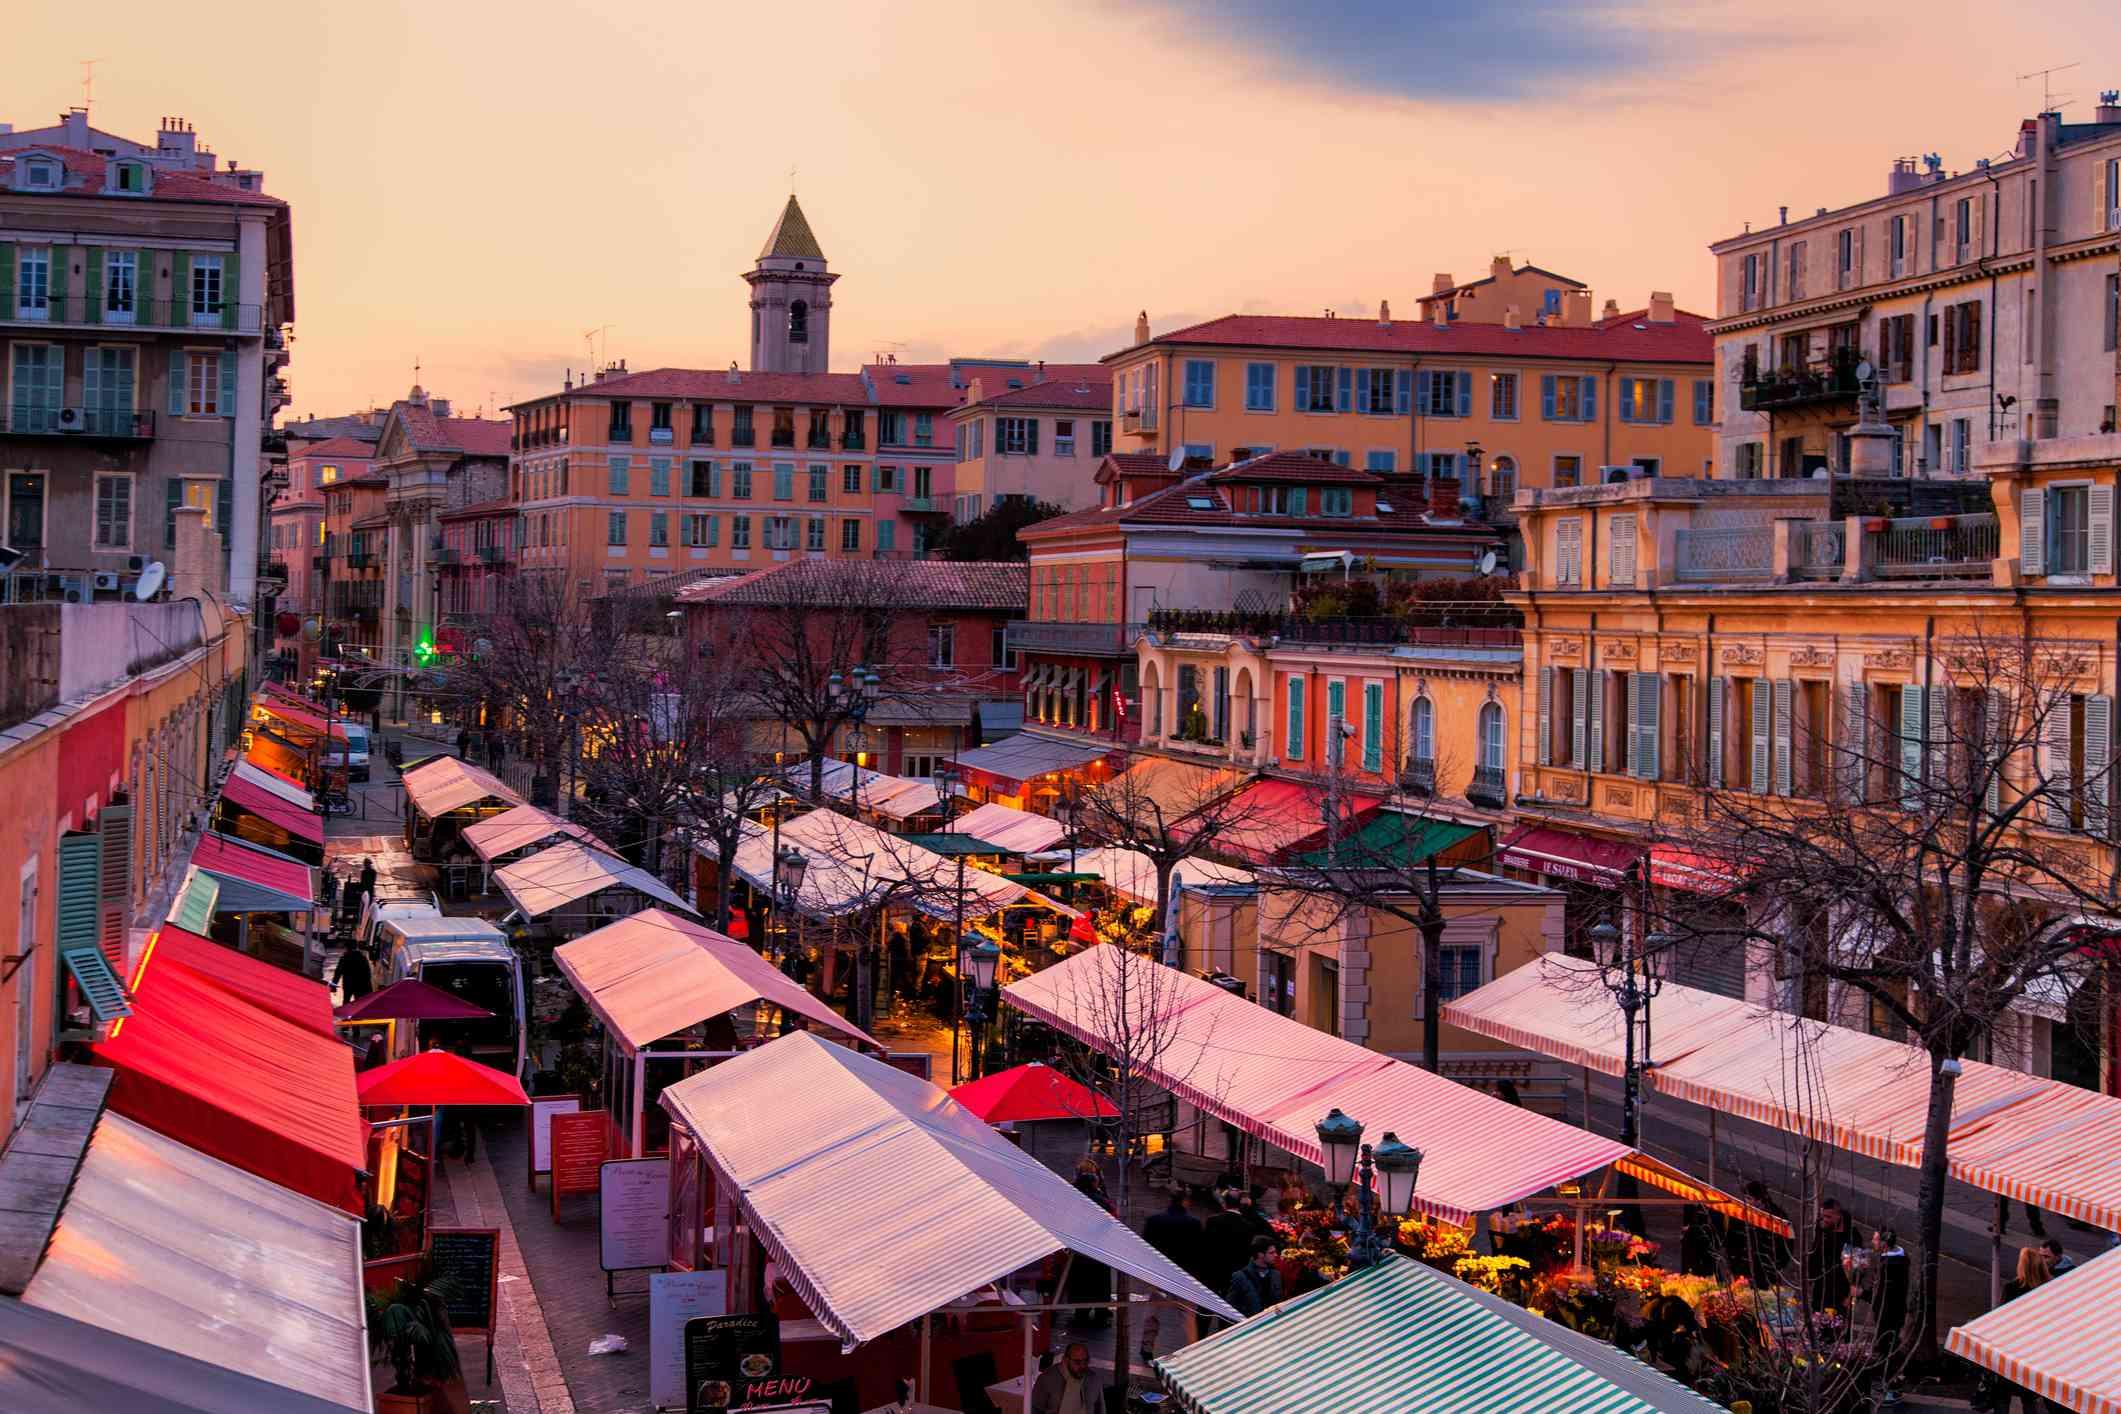 Cours Saleya Market, Nice, France